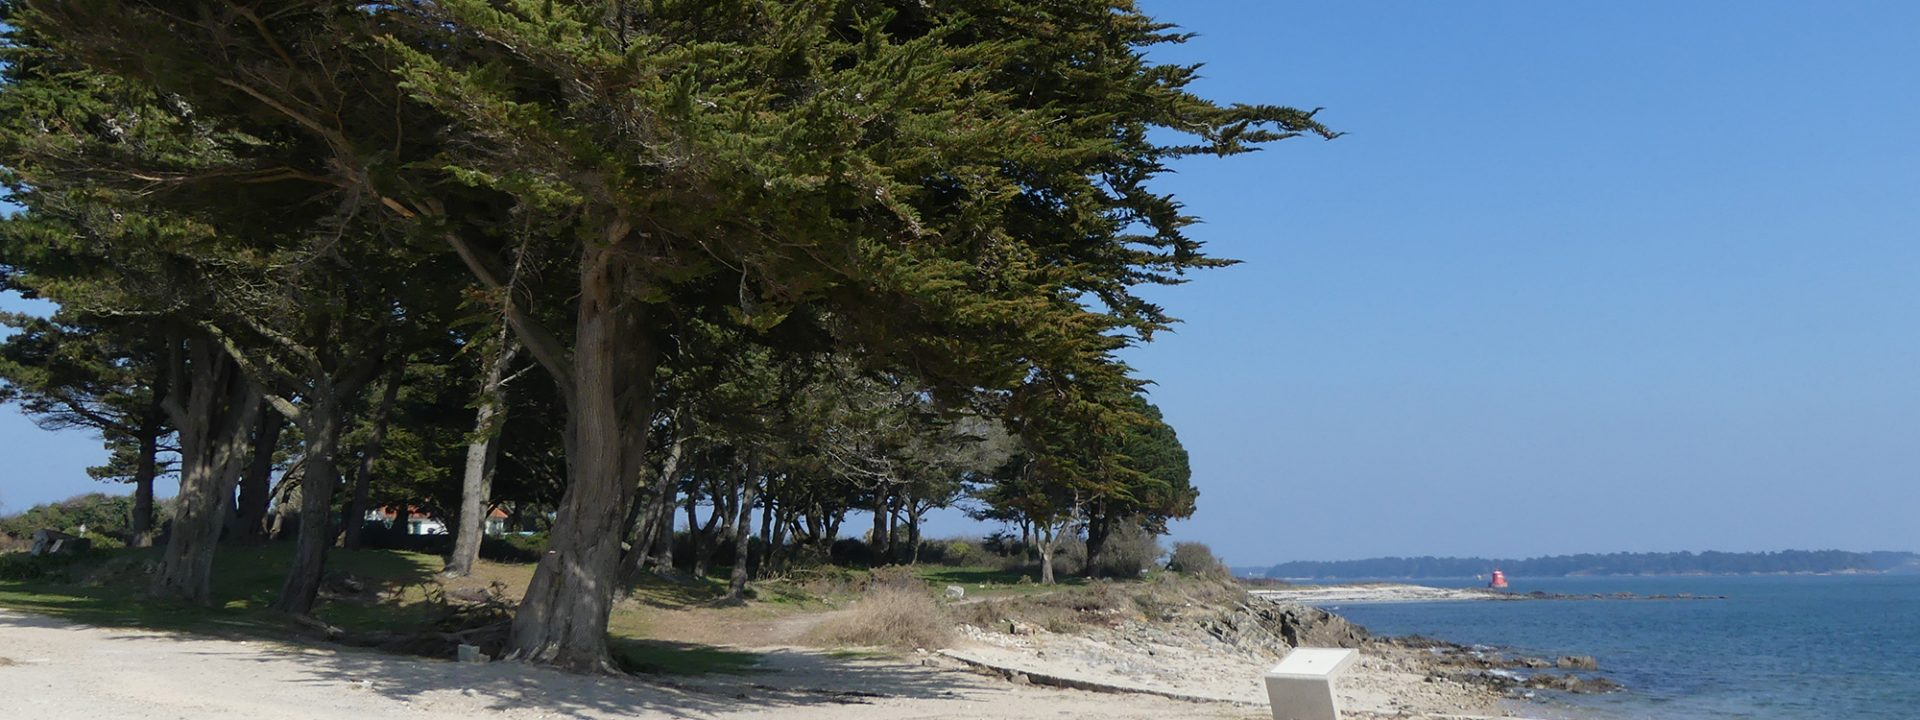 Locmariaquer, golfe du Morbihan